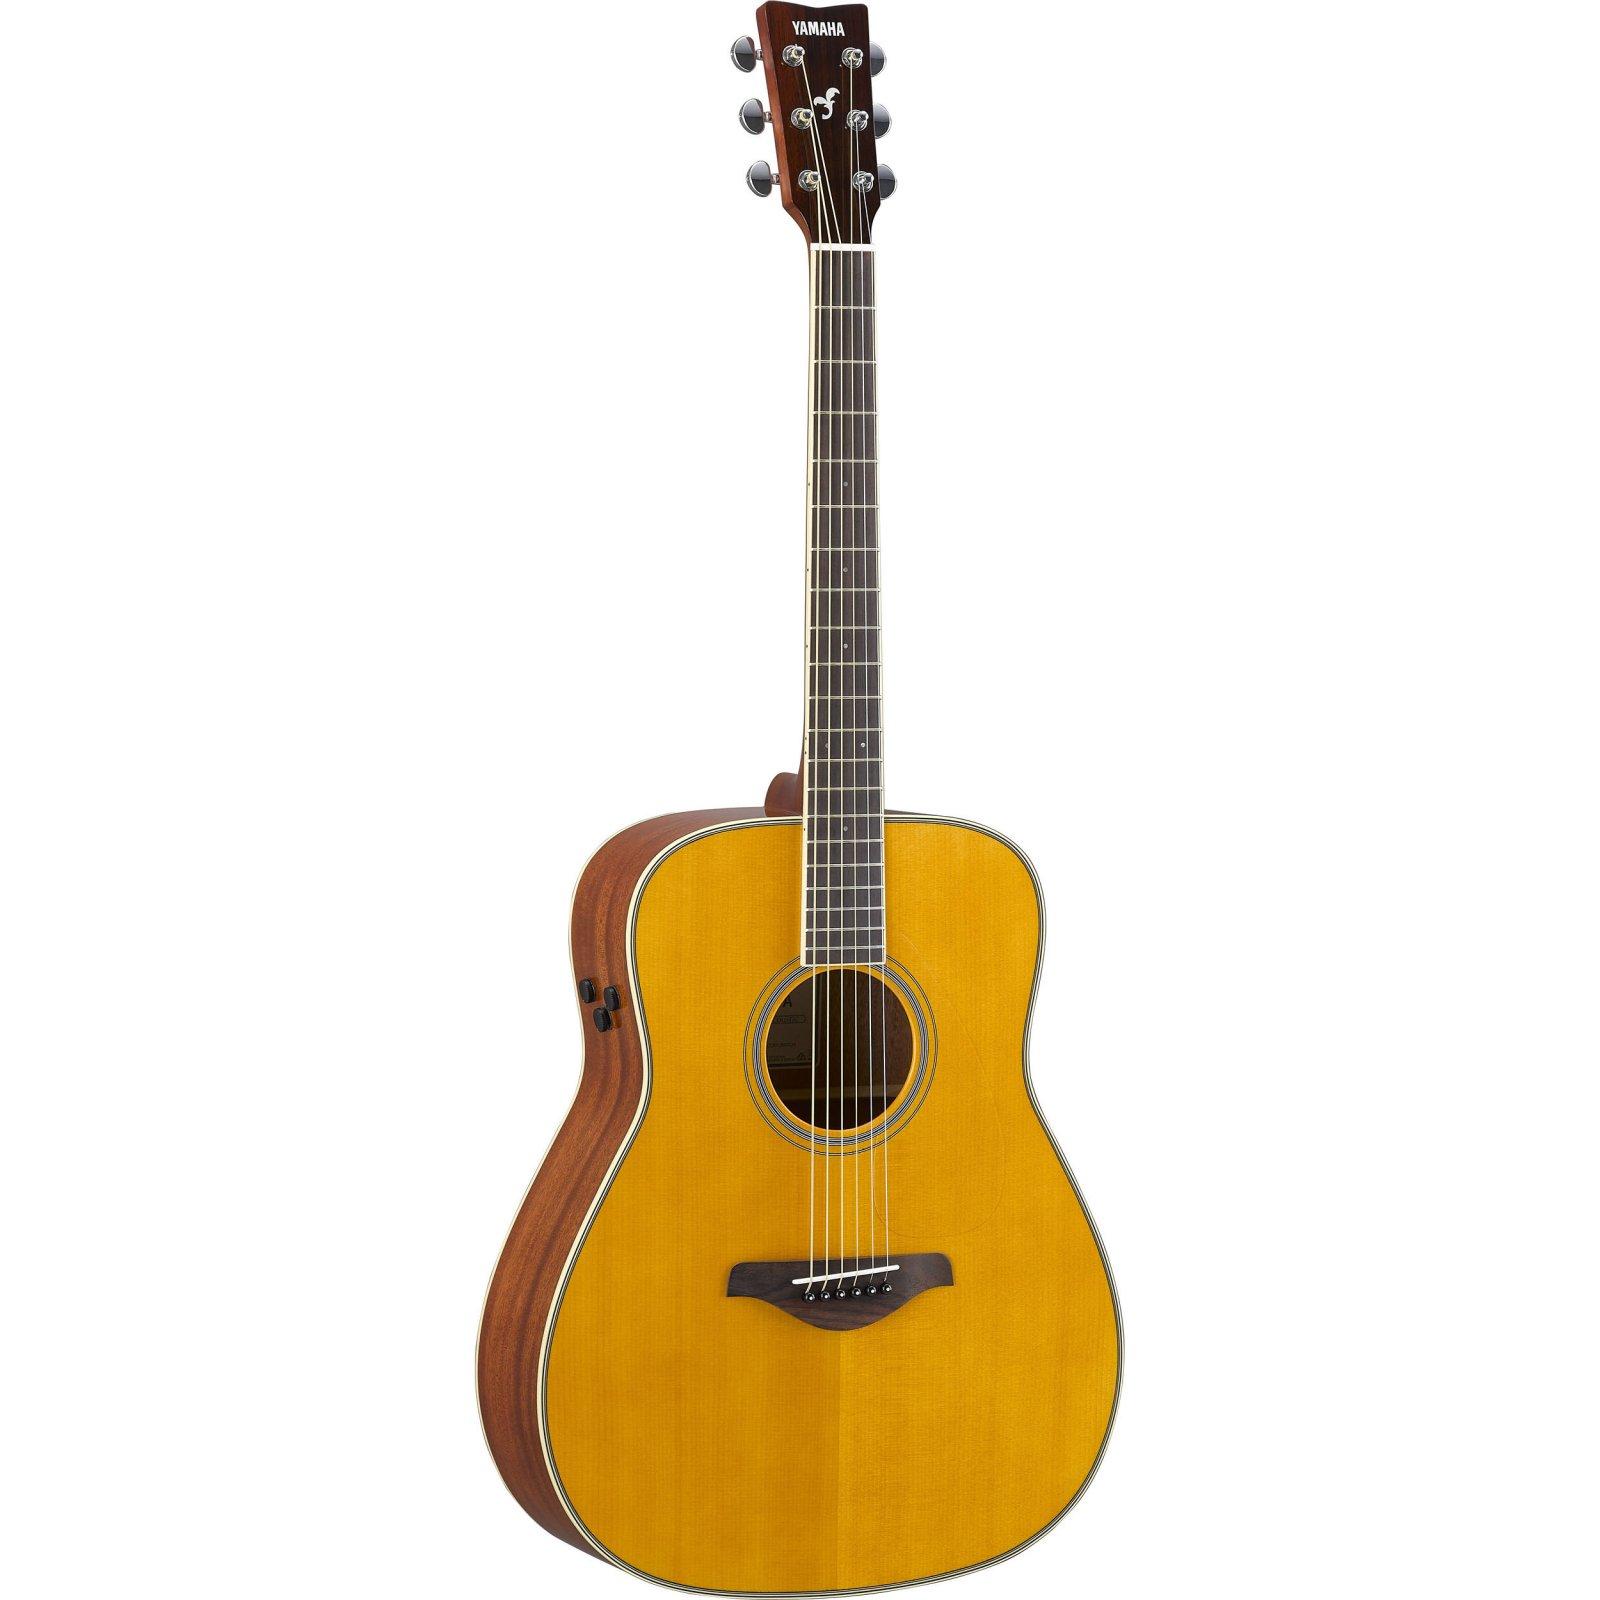 Yamaha FG-TA VT TransAcoustic Dreadnought Acoustic-Electric Guitar Vintage Tint